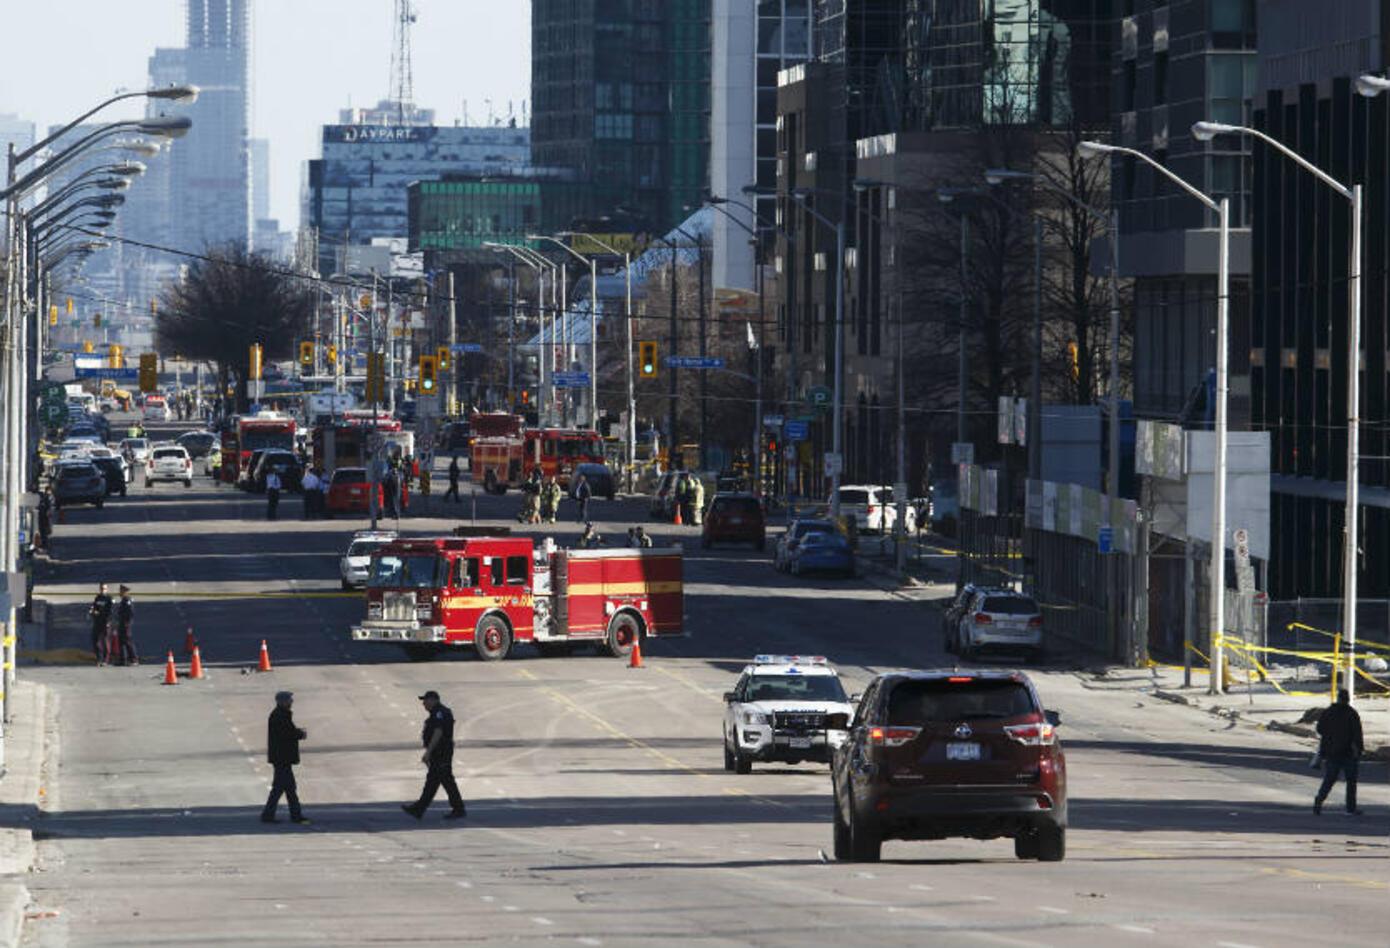 Atropello en Toronto